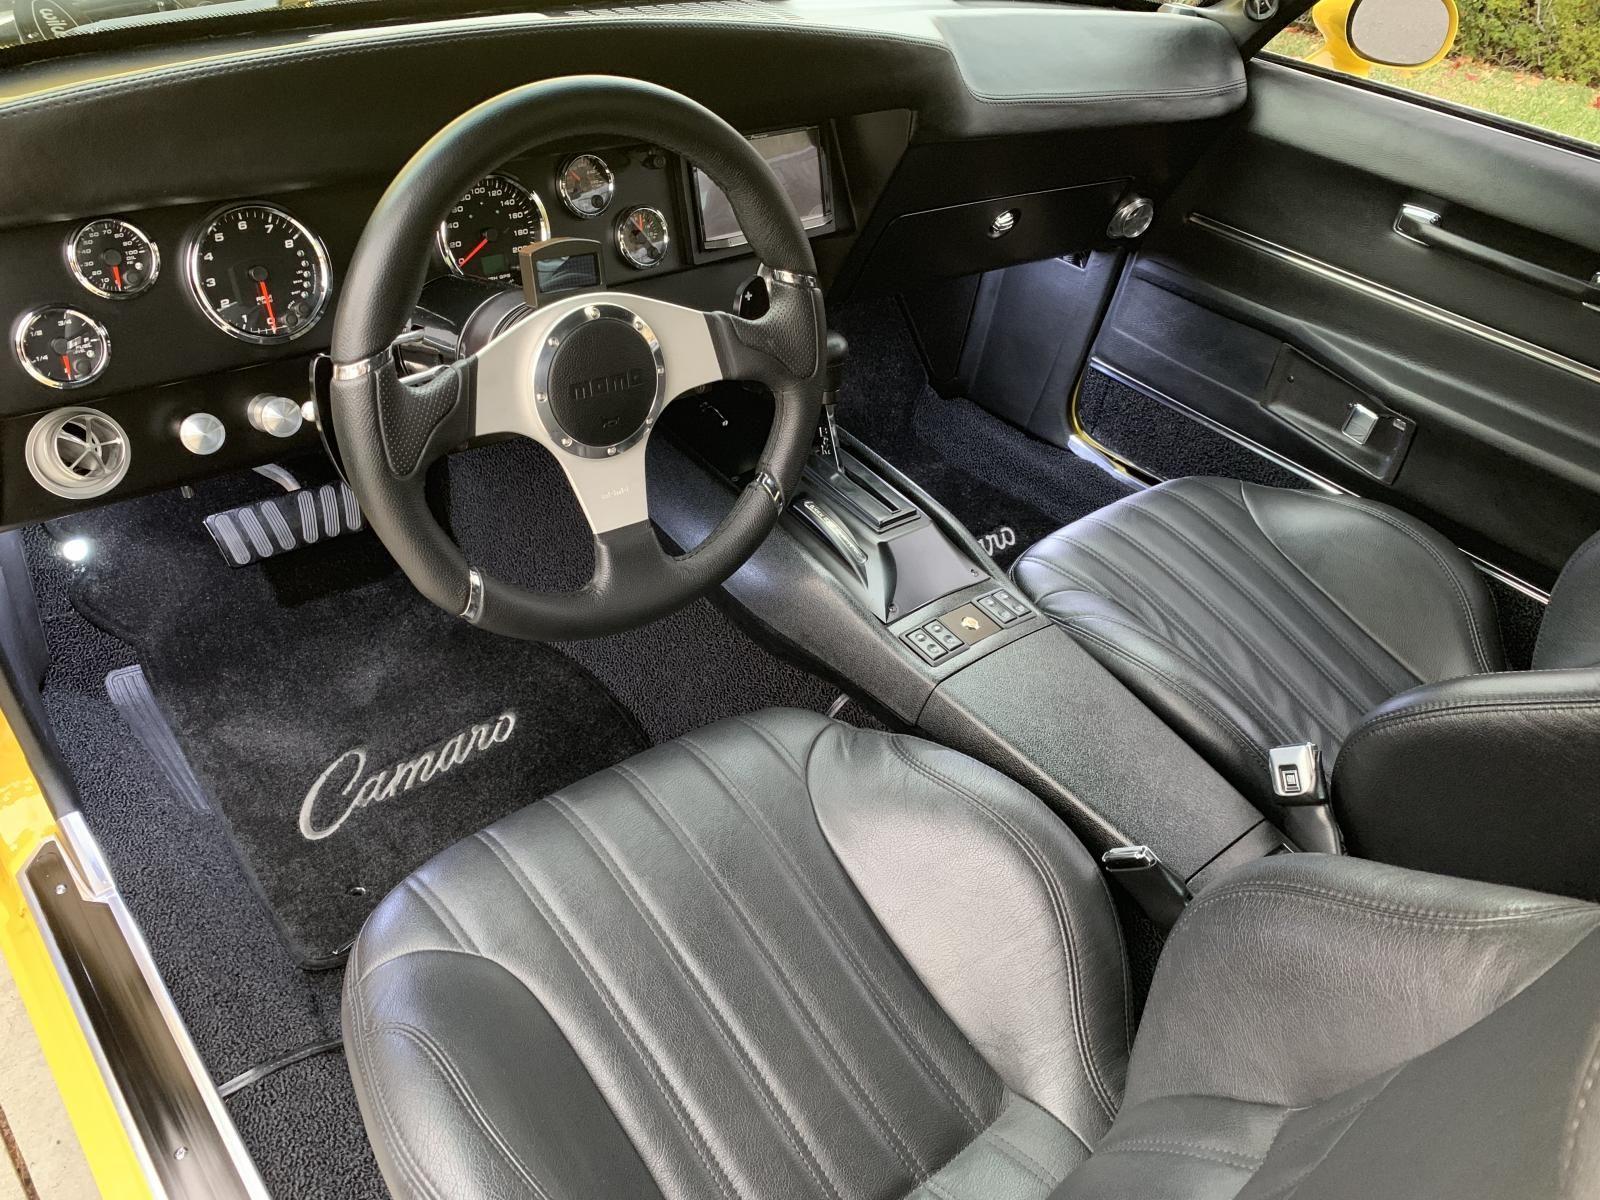 Pin On 1969 Chevrolet Camaro Lt4 Pro Touring Build